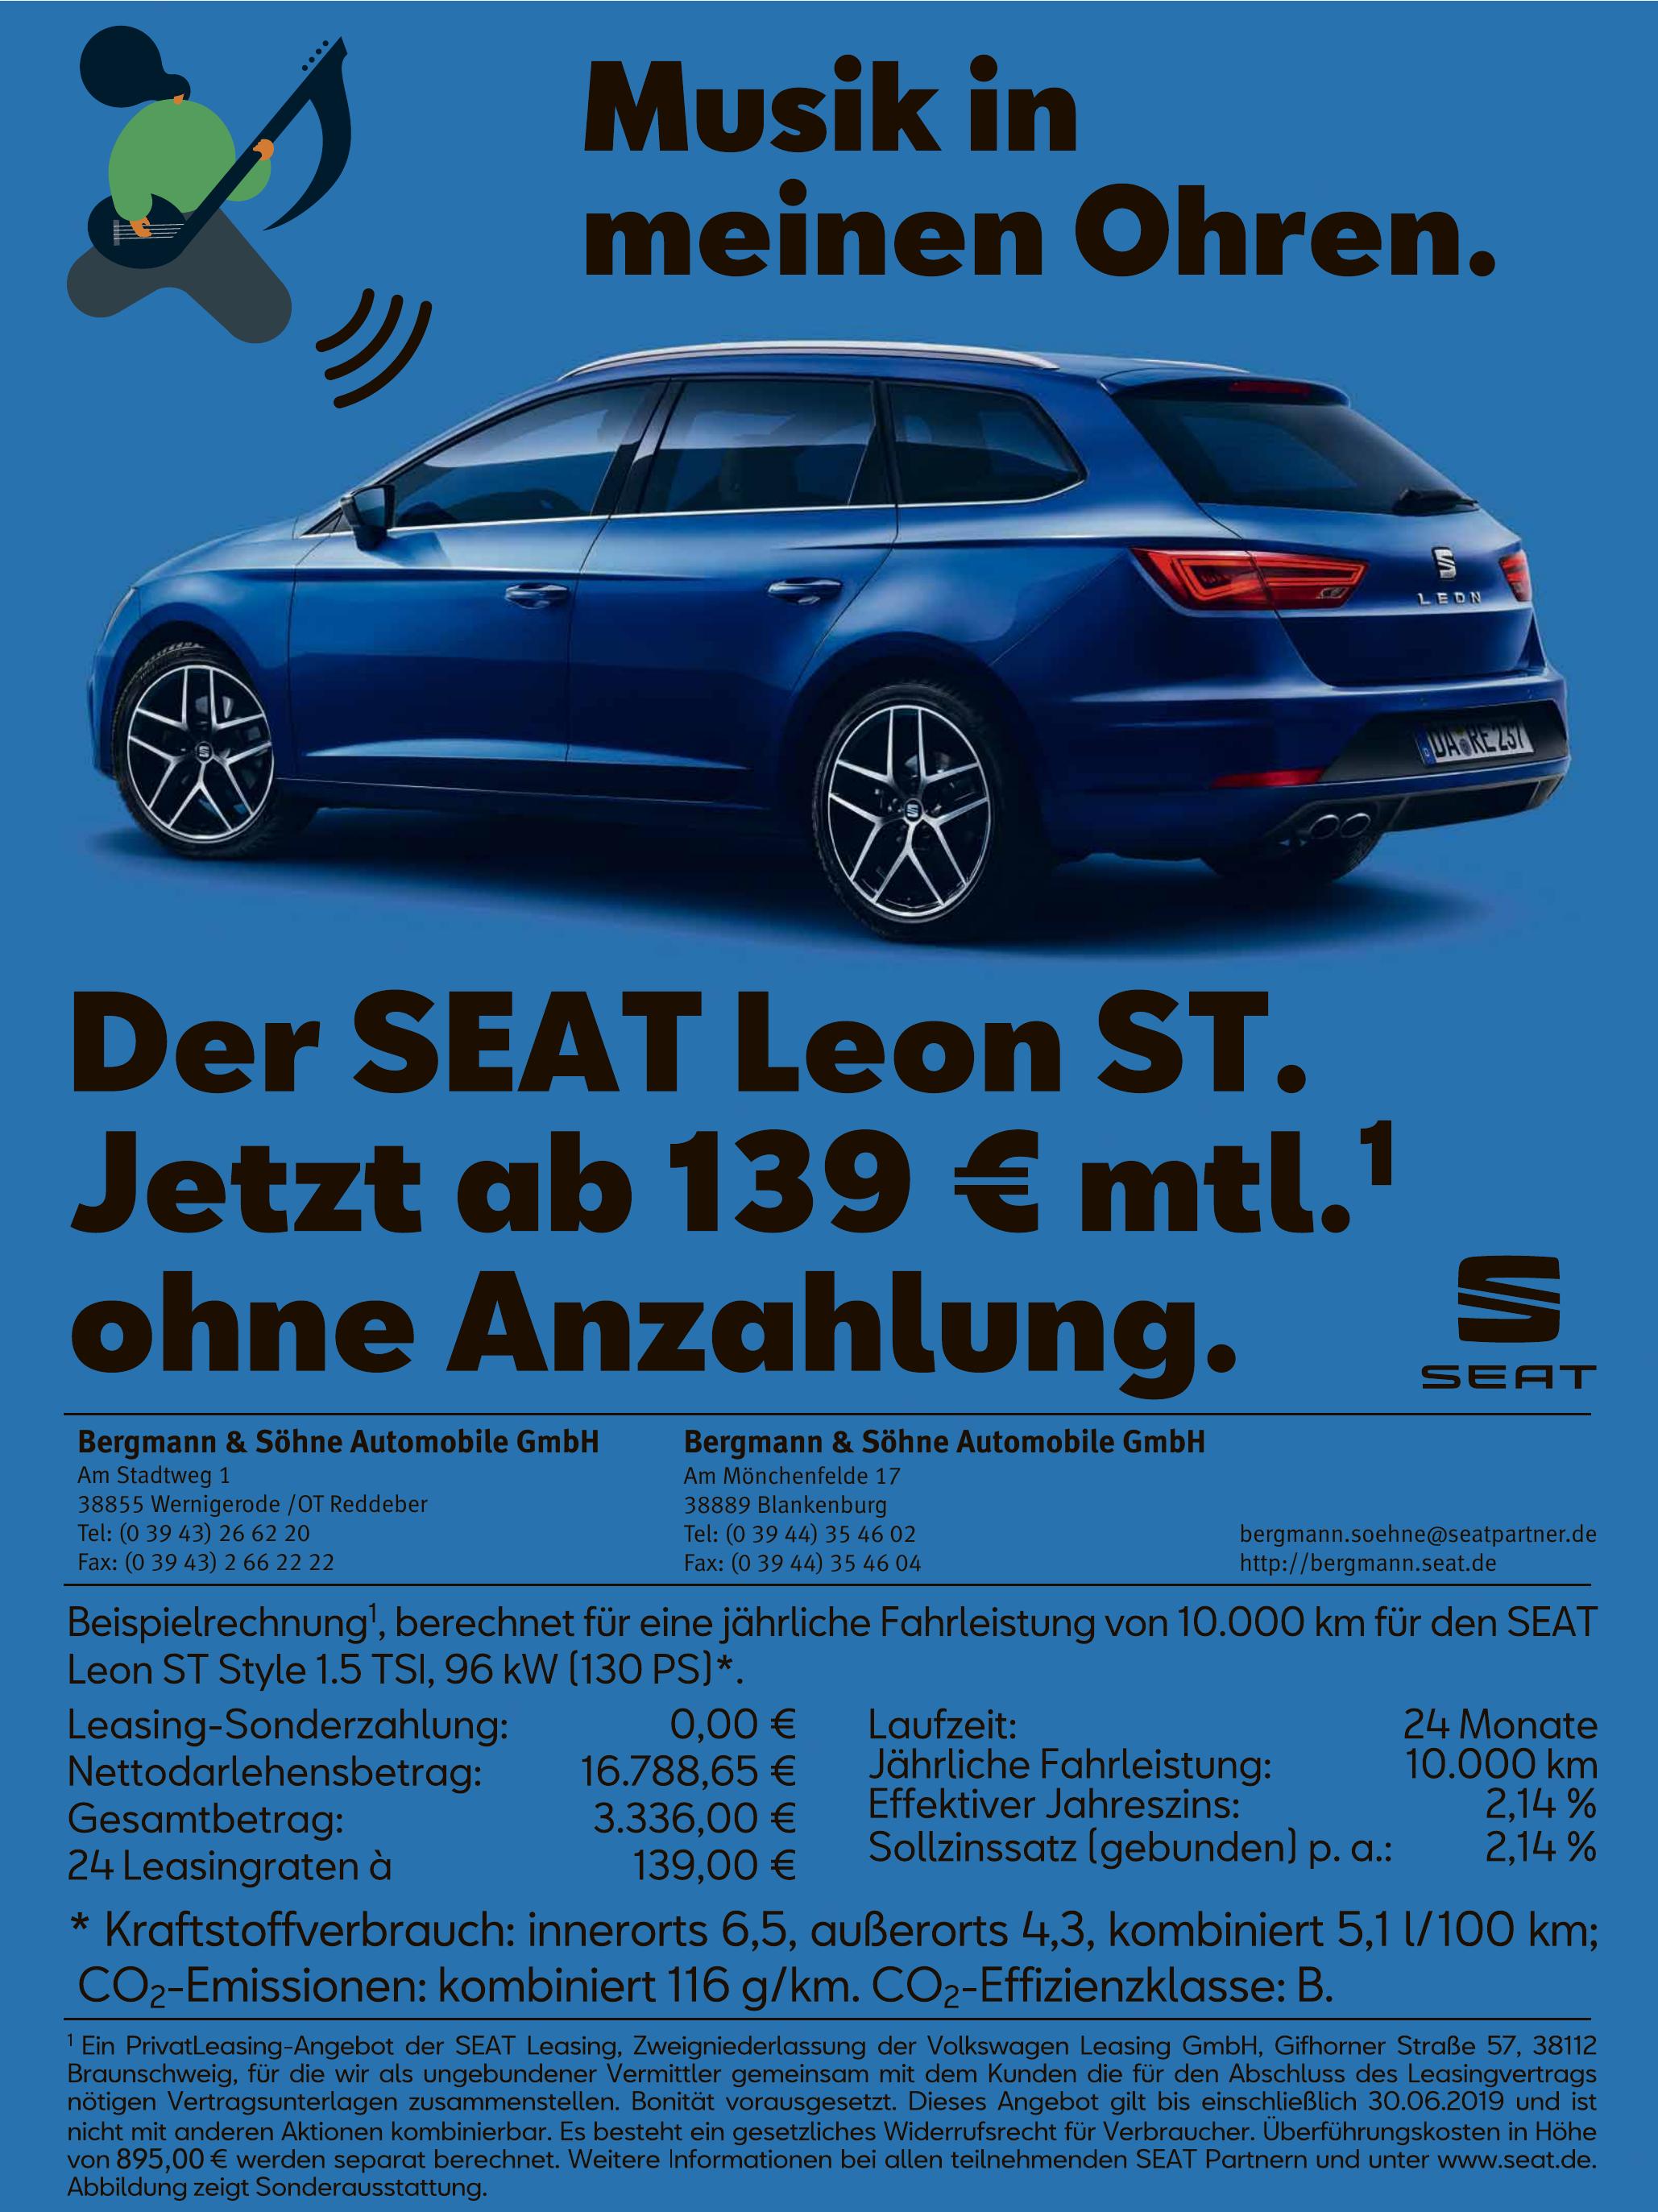 Bergmann & Söhne Automobile GmbH